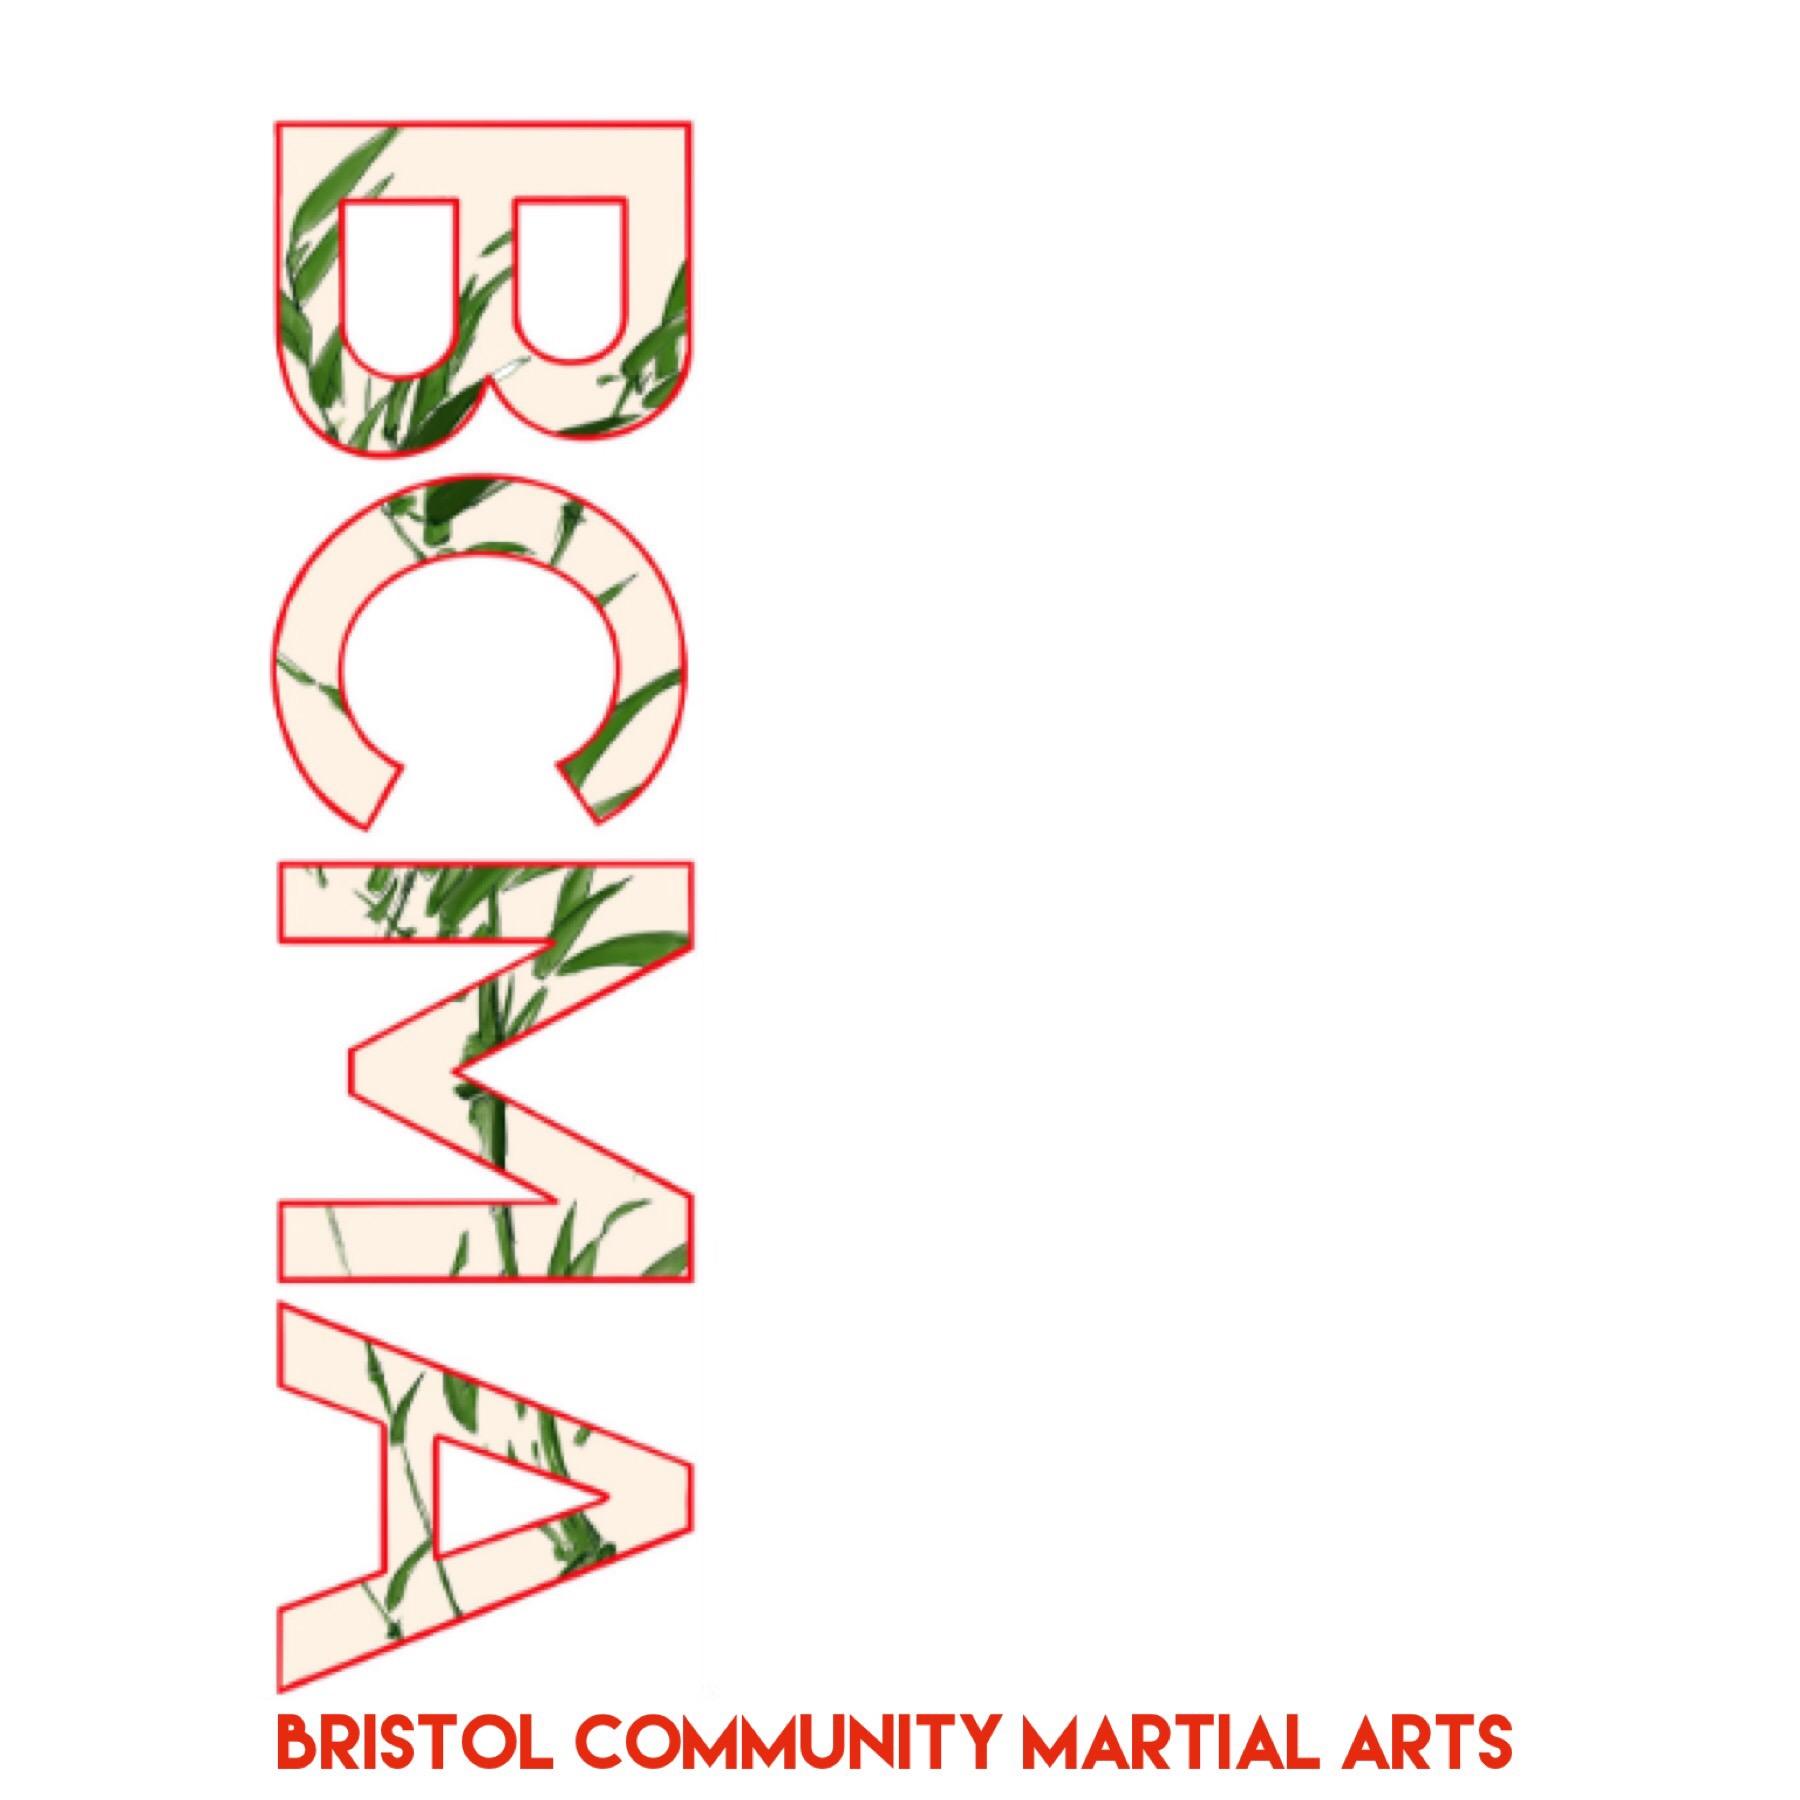 Bristol Community Martial Arts